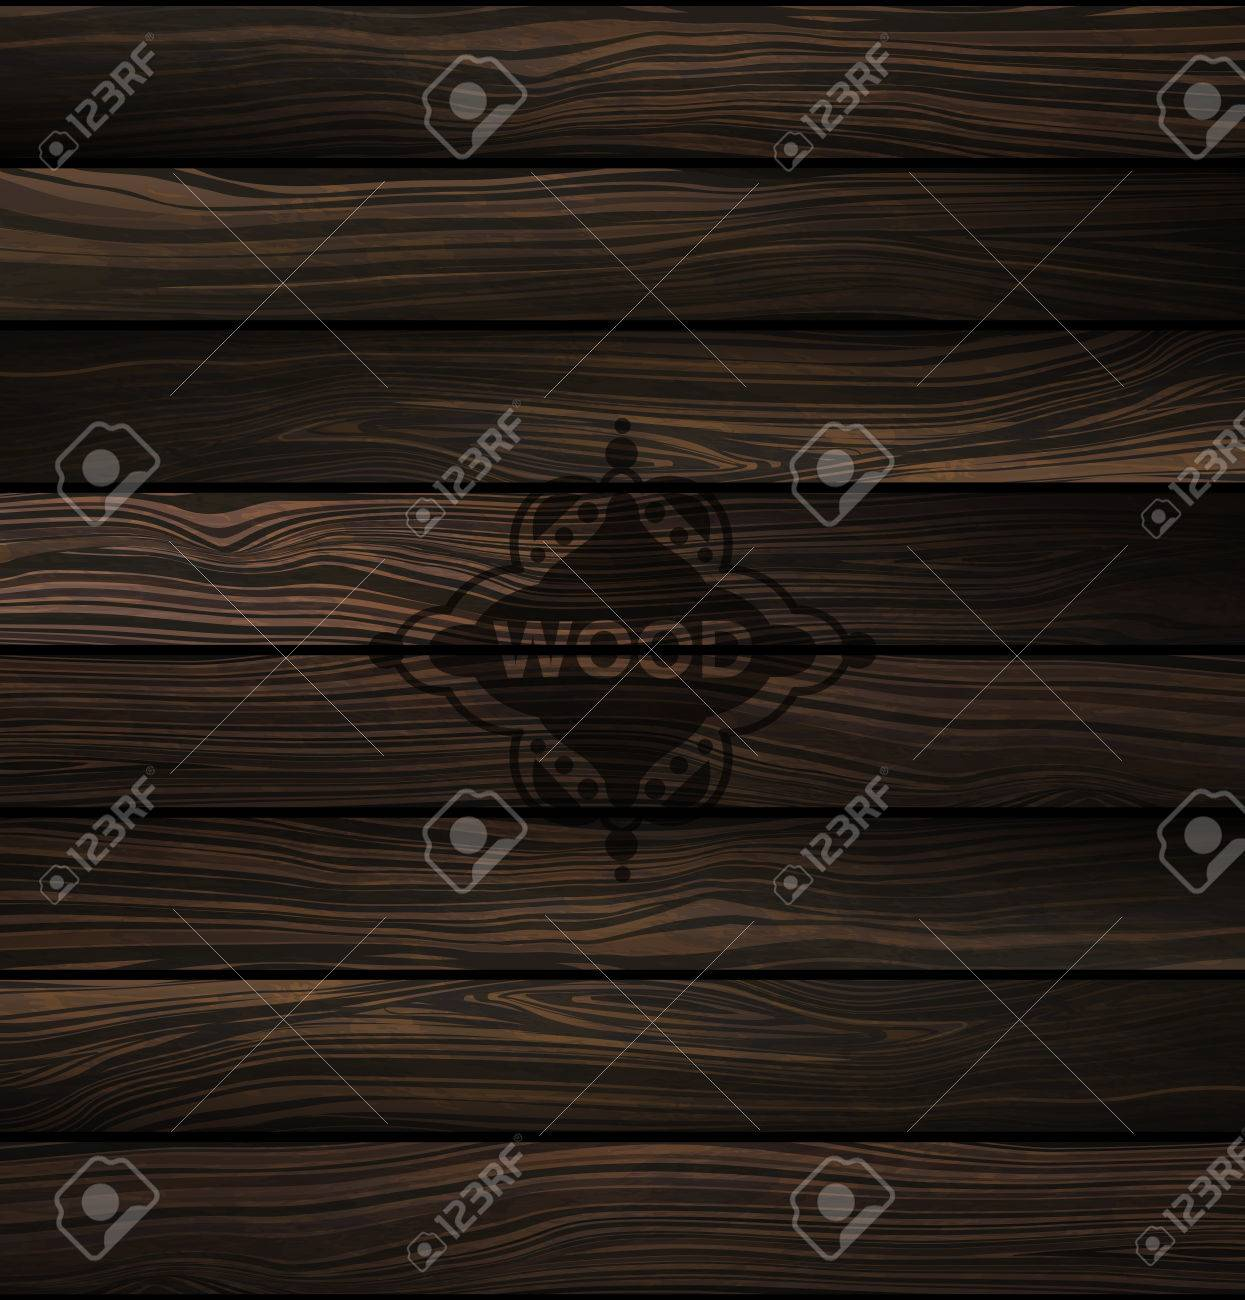 dark hardwood floor pattern. Natural Dark Wooden Background. Parquet Wallpaper. Boardwalk Illustration. Tree Bark Pattern. Old Panels. Vintage Plank. Timber Floor. Hardwood Floor Pattern R